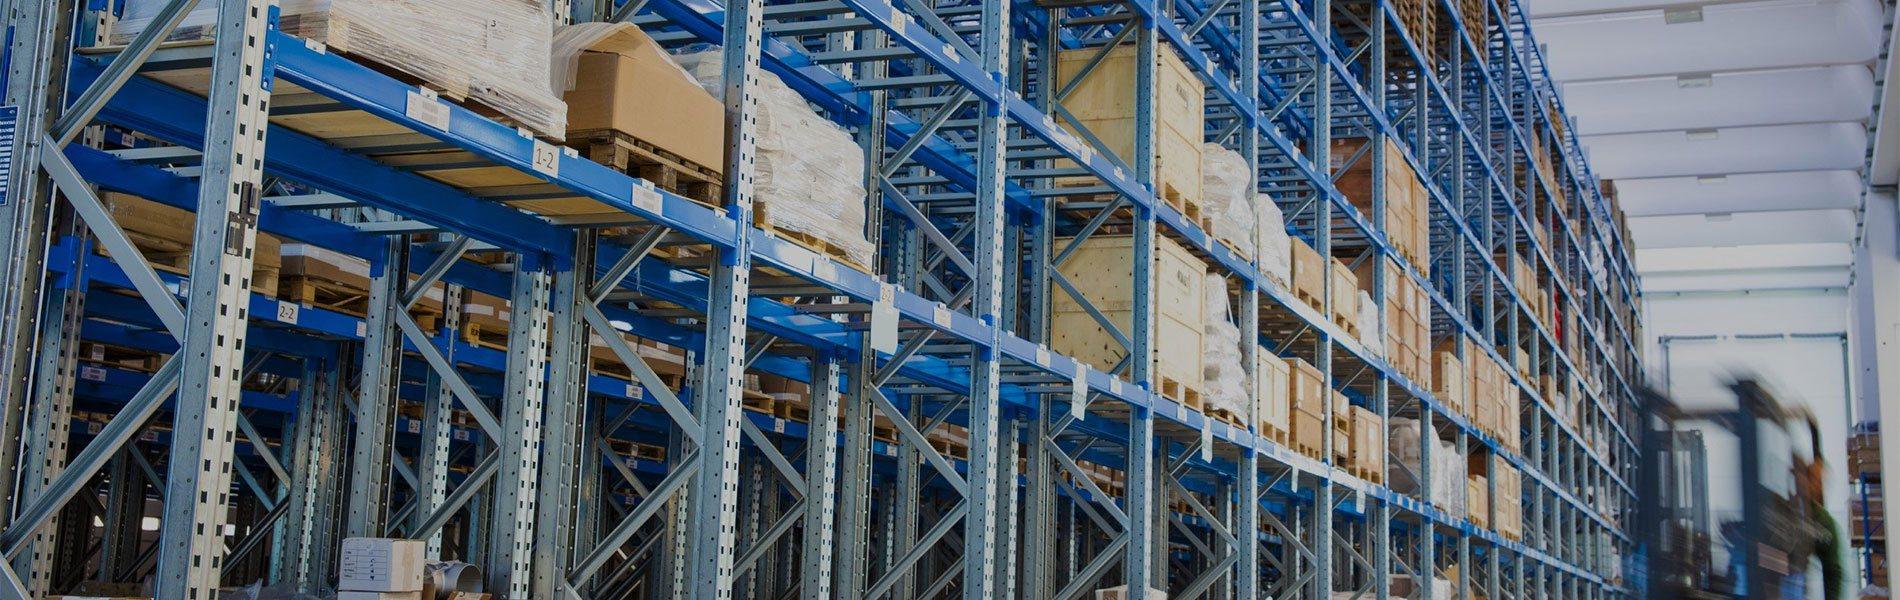 Forklift Training Warehouse